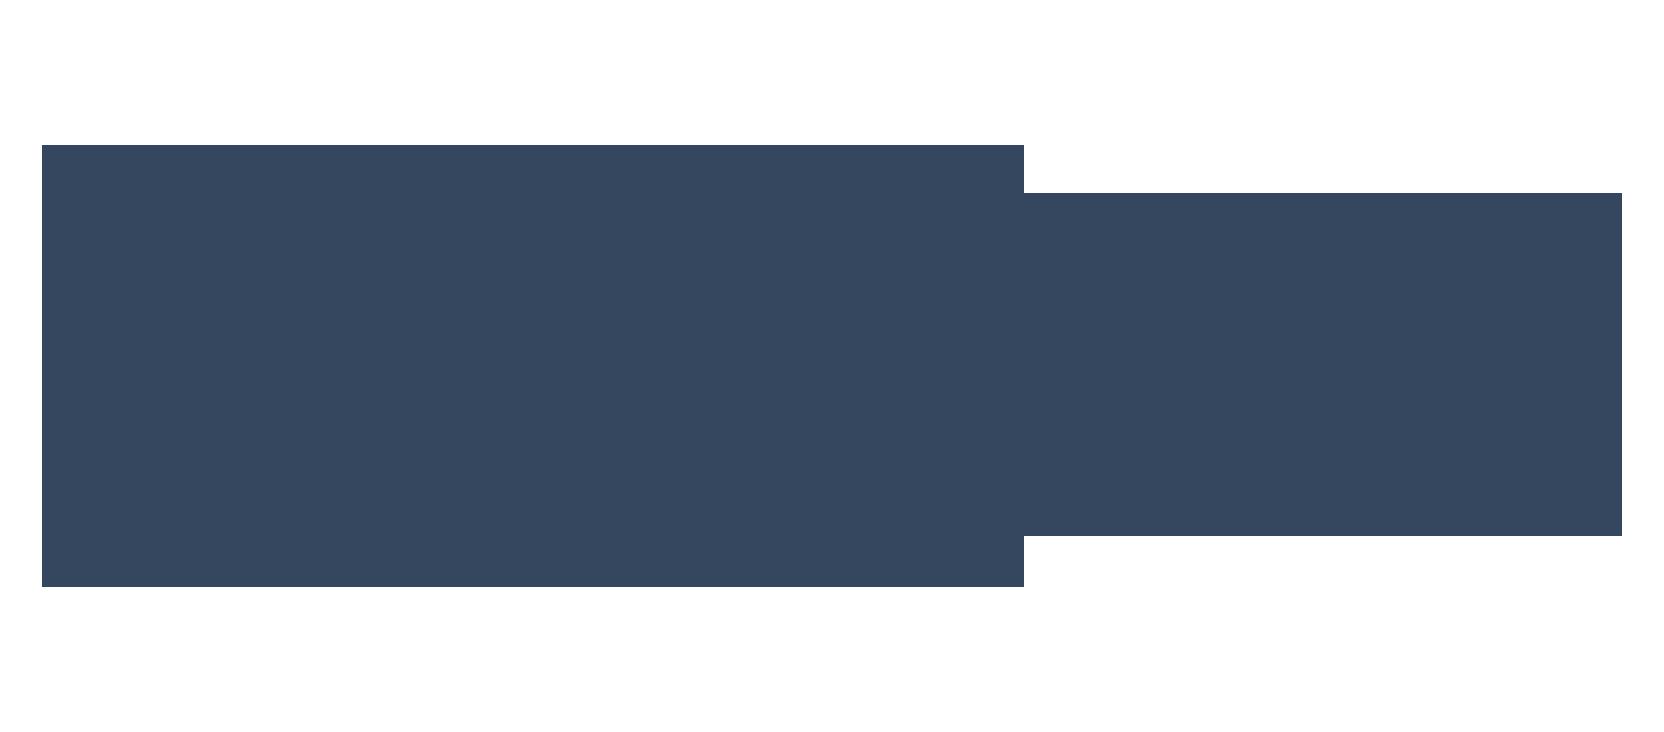 National Bank credit cards